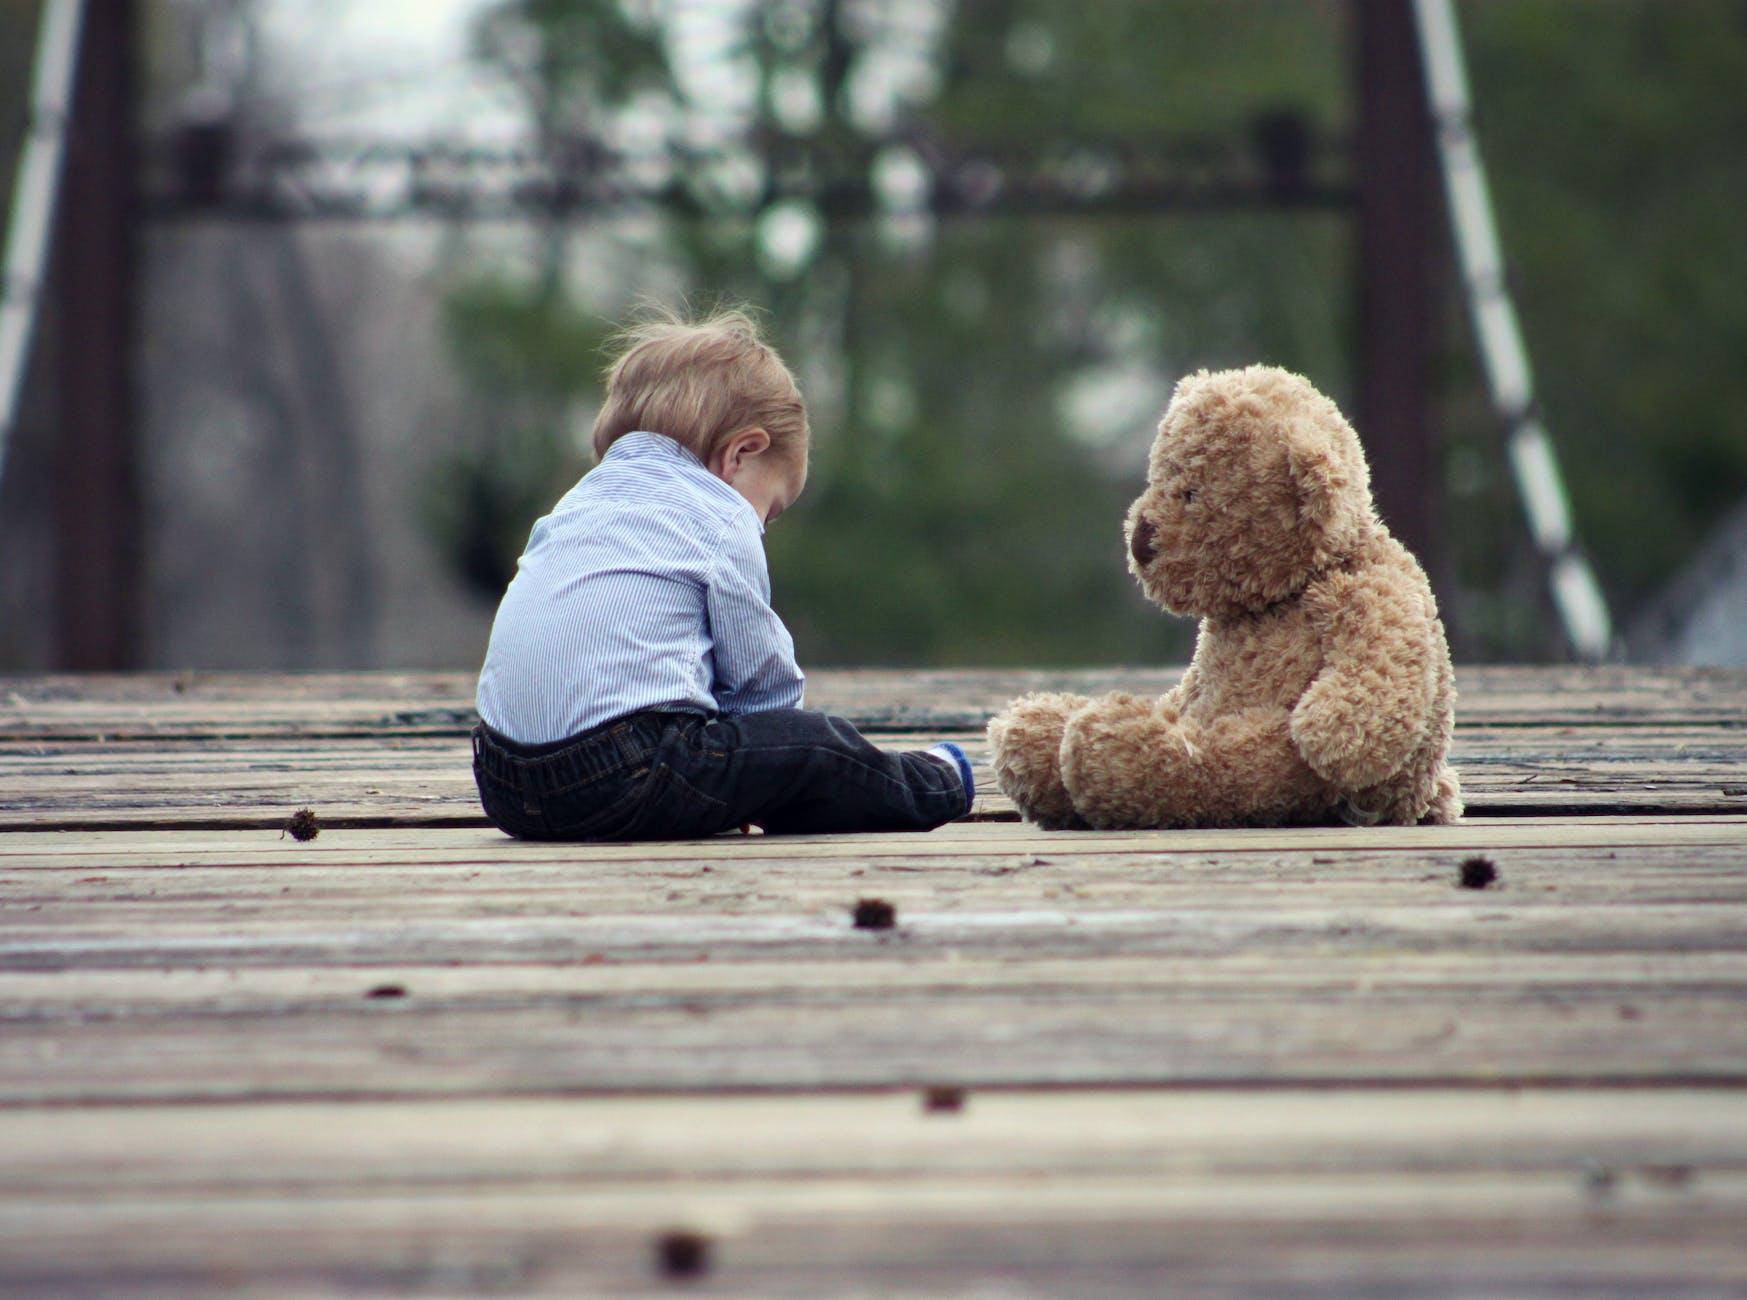 baby-teddy-bear-cute-39369.jpeg?auto=compress&cs=tinysrgb&dpr=2&h=650&w=940